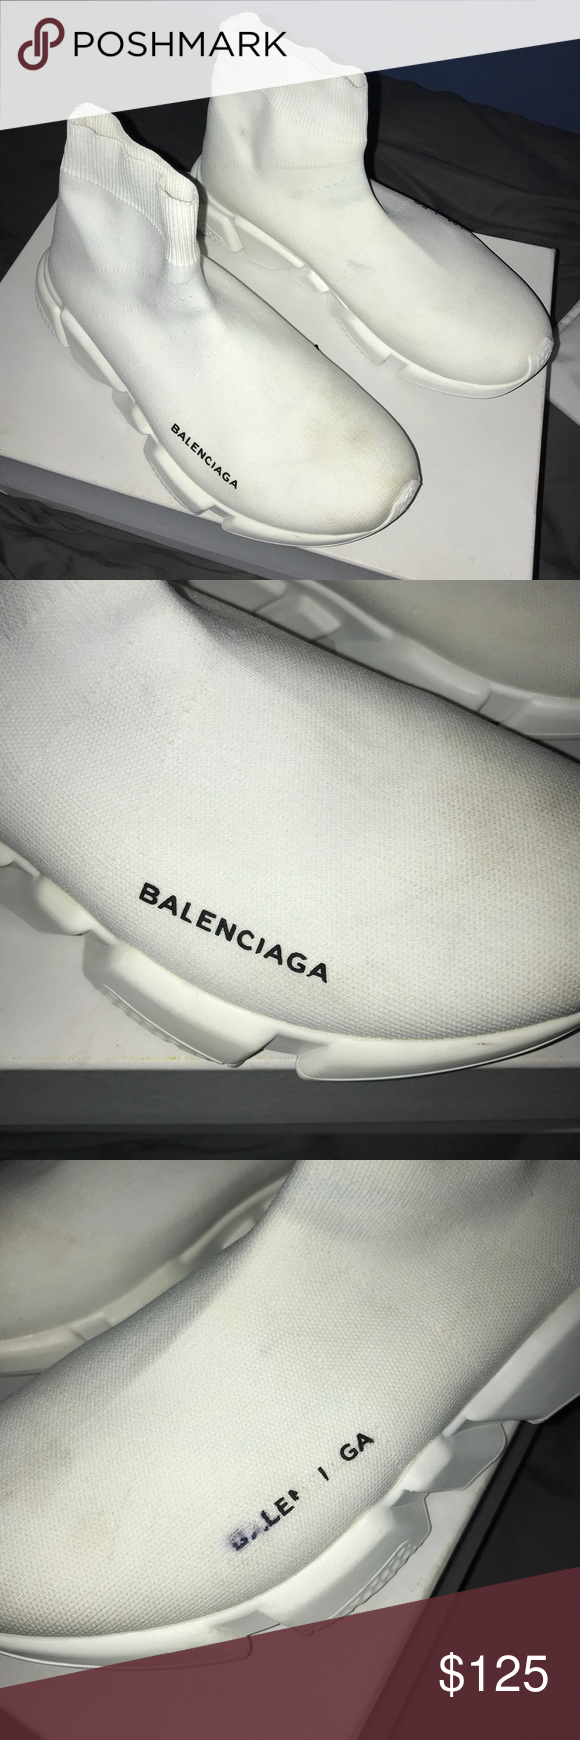 Balenciaga Speed Sock Runner damaged